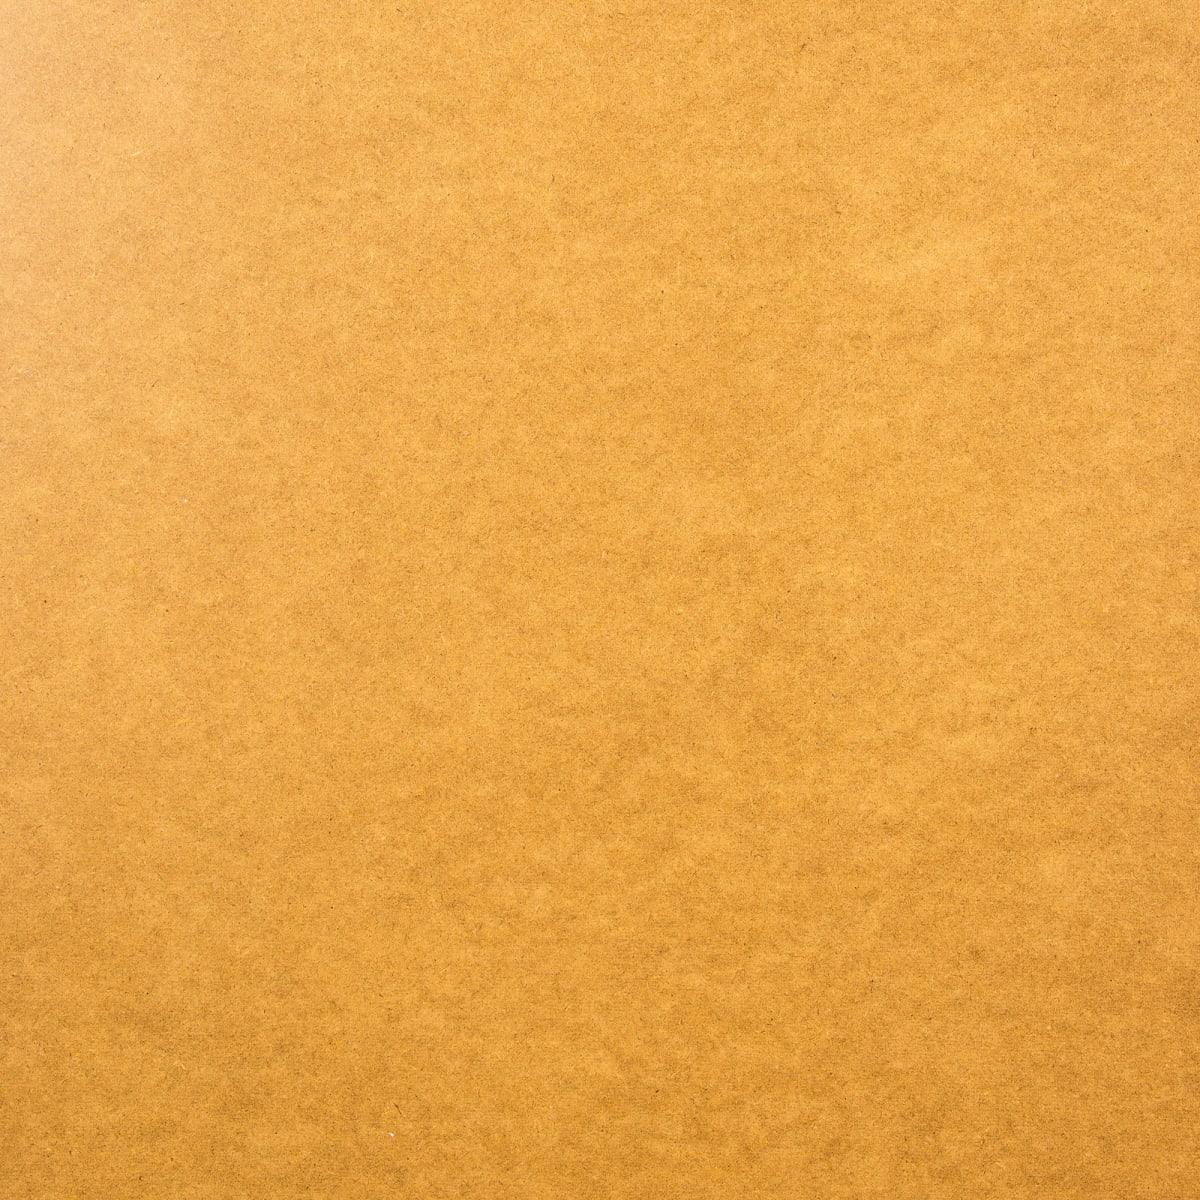 Плита ХДФ 4 мм 1400х2070 мм, 2.898 м²